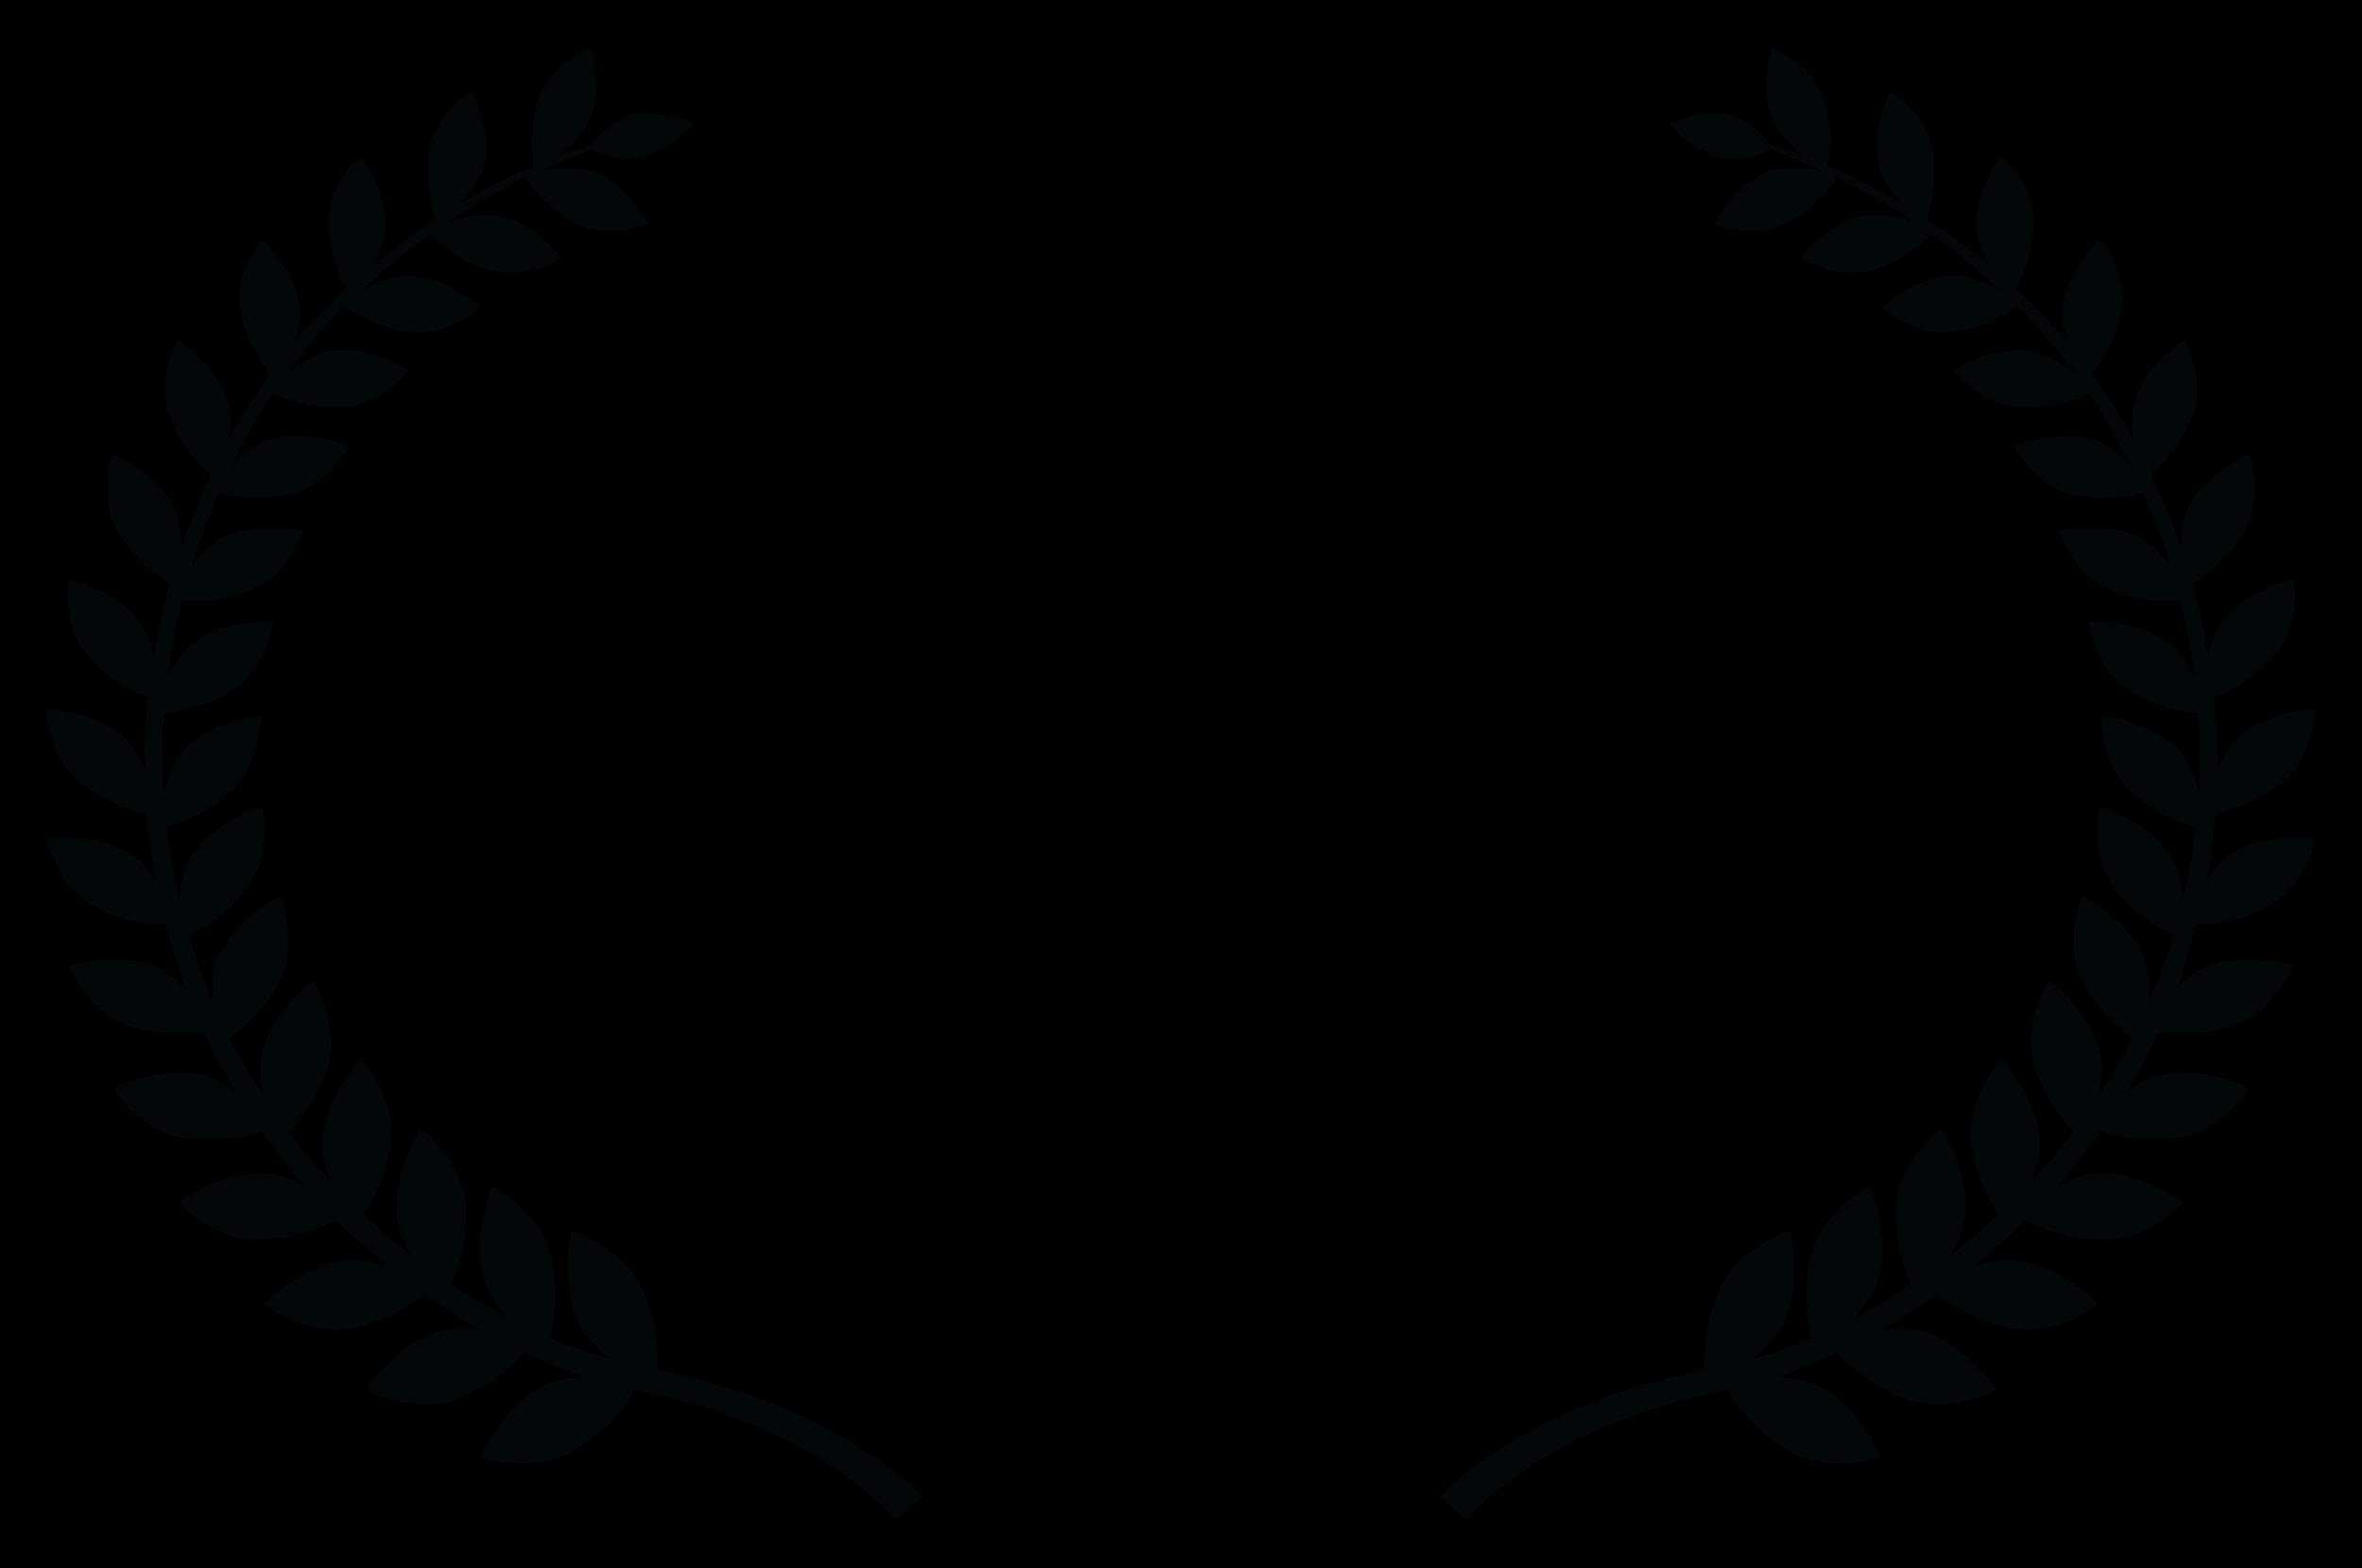 OFFICIALSELECTION-DocuWestDocumentaryFilmFestival-2018.png